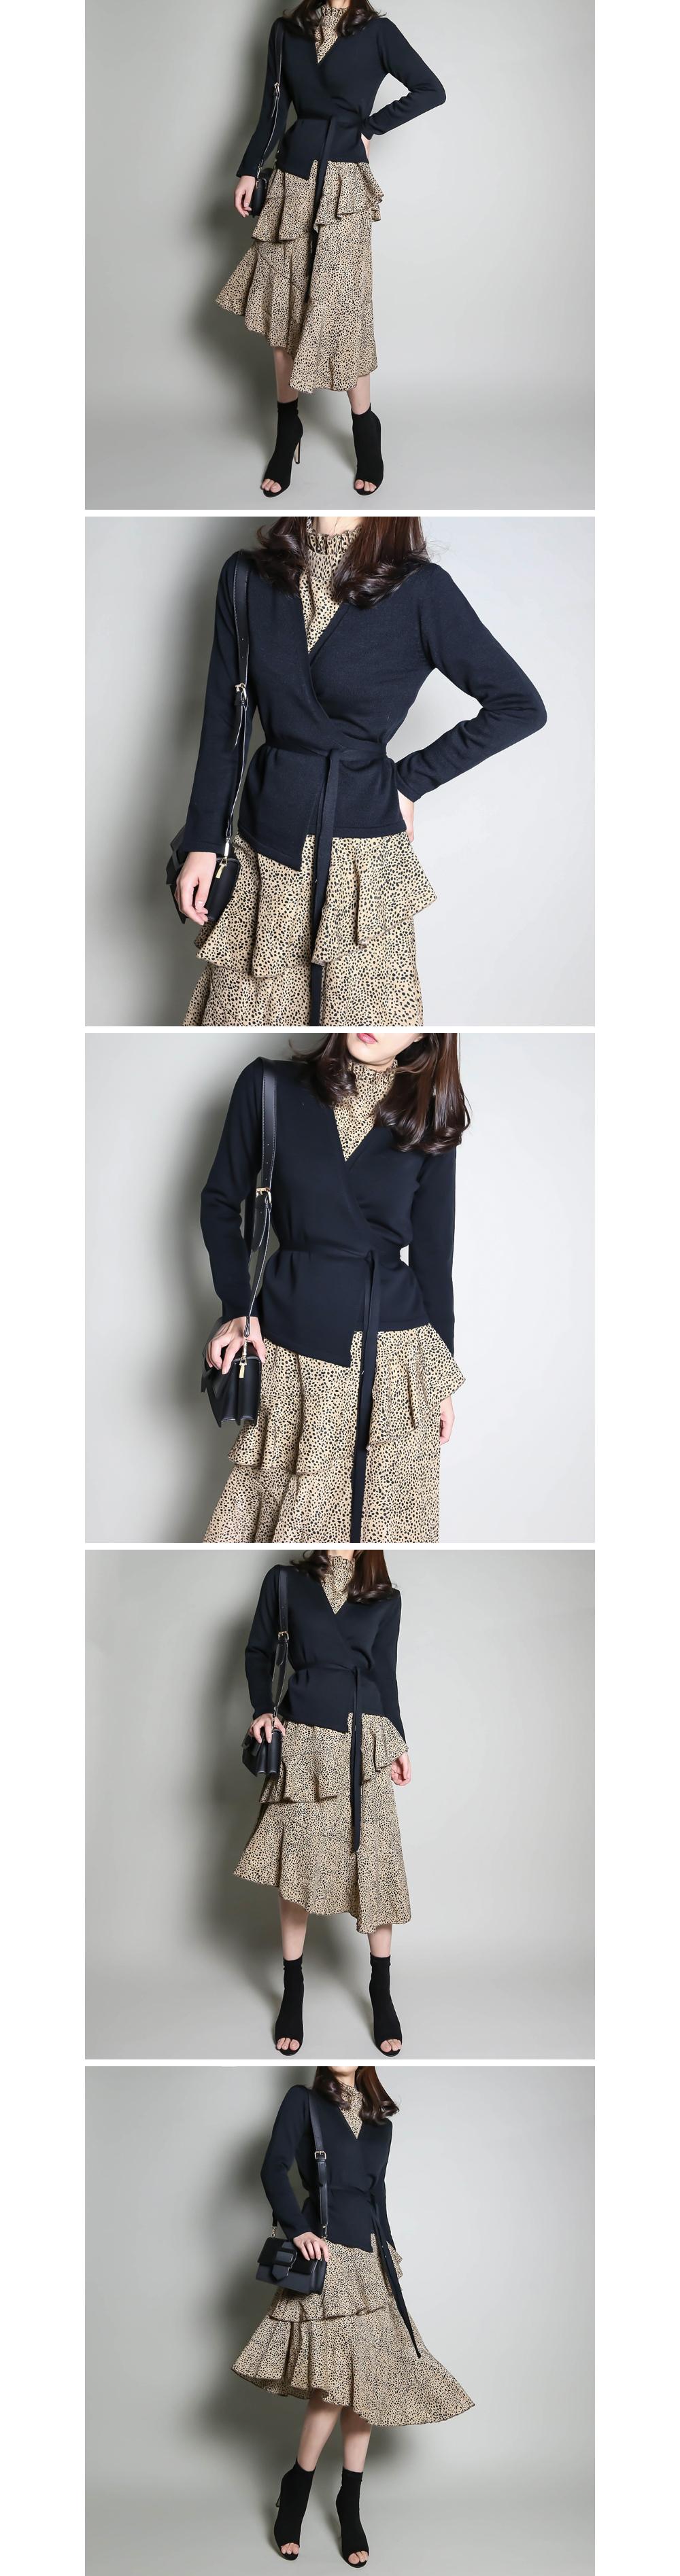 Lap strap knit cardigan _cd2970